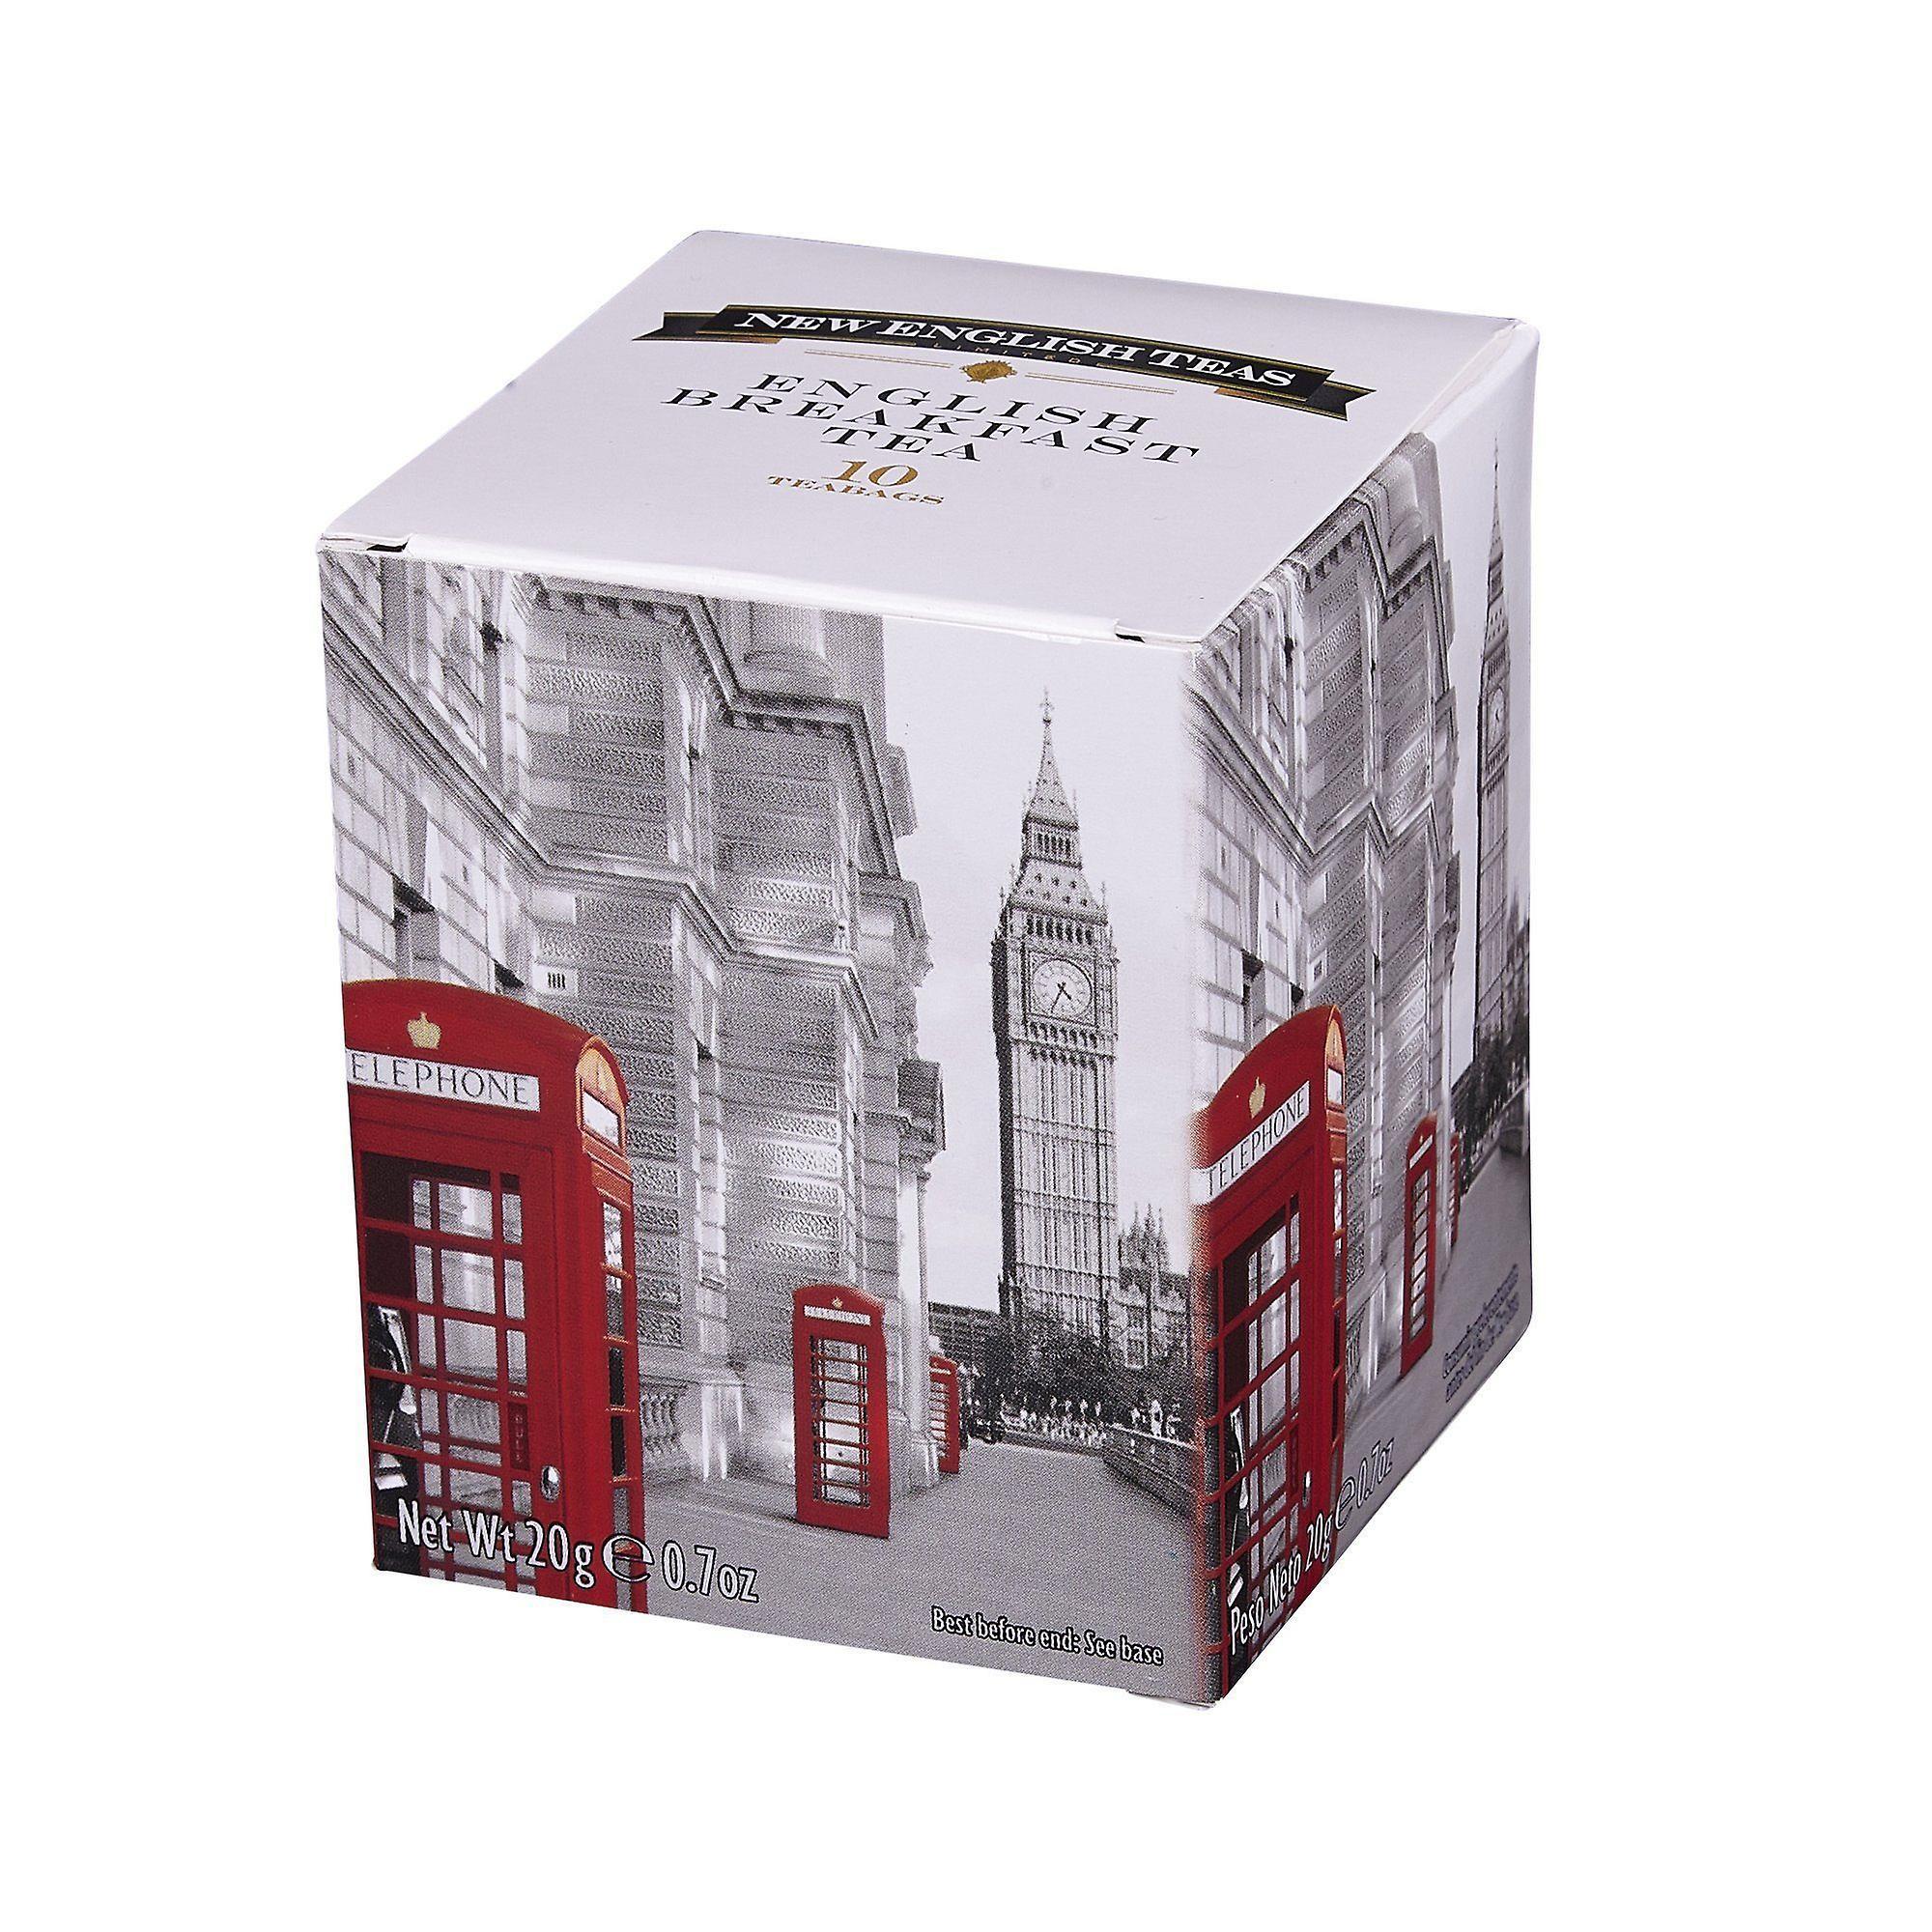 Red telephone box english breakfast tea 10 teabag carton